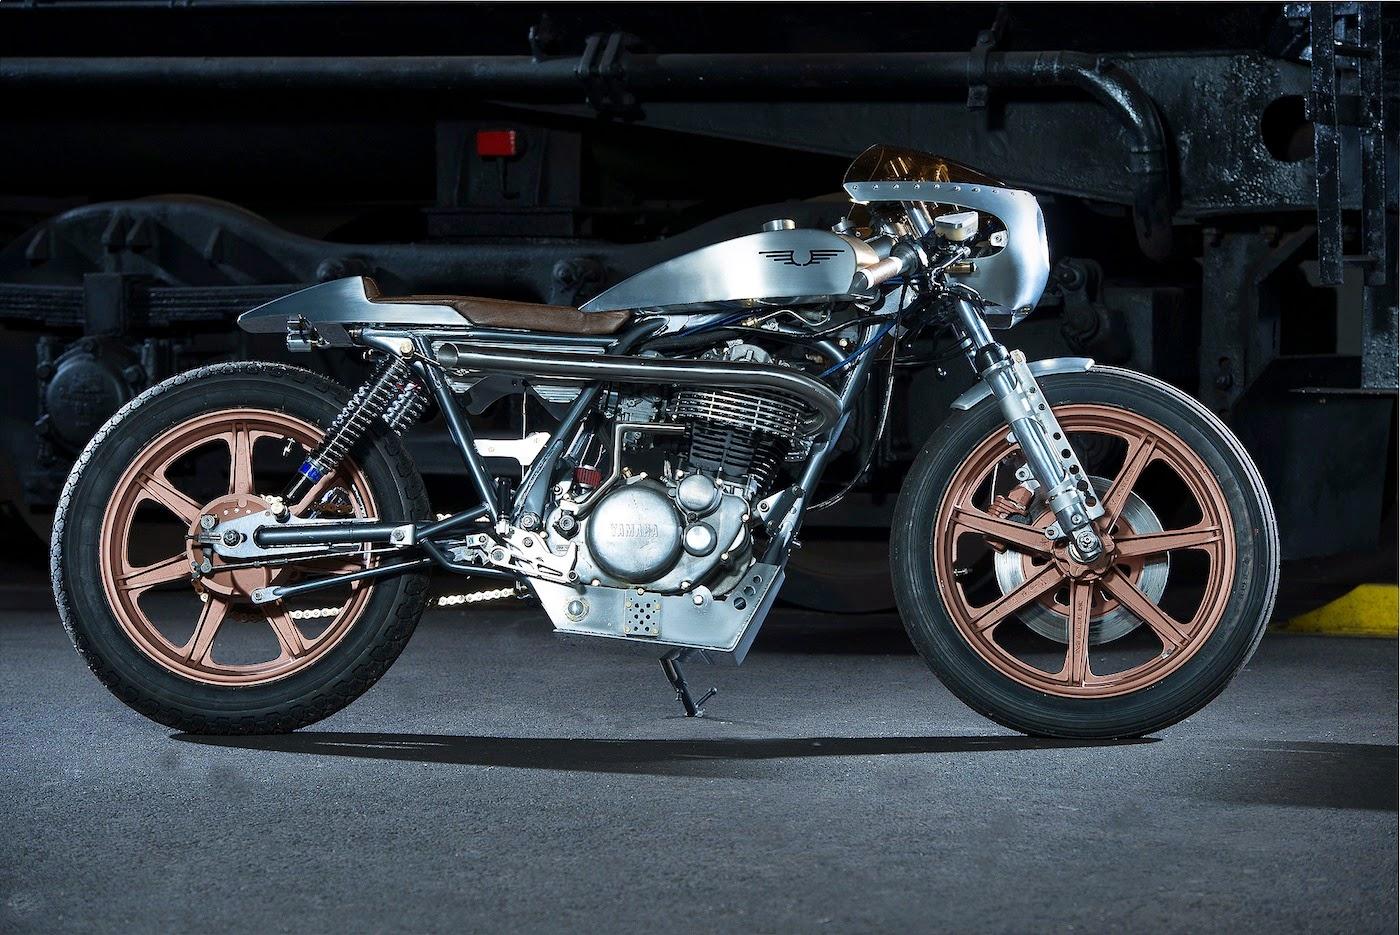 Yamaha XS750 Cafe Racer - BikeBound